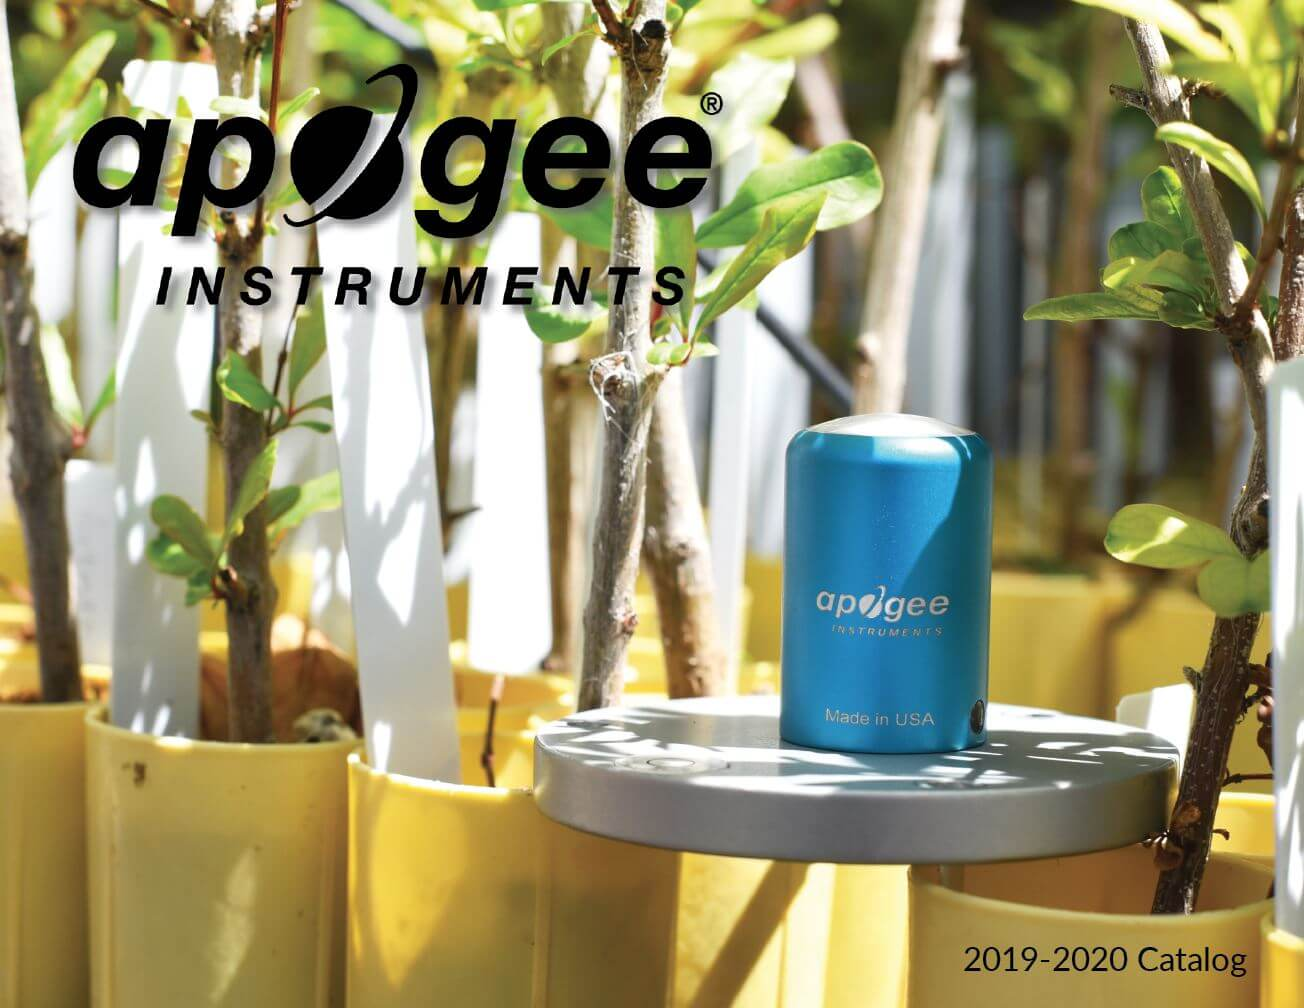 Apogee Instruments Product Catalog